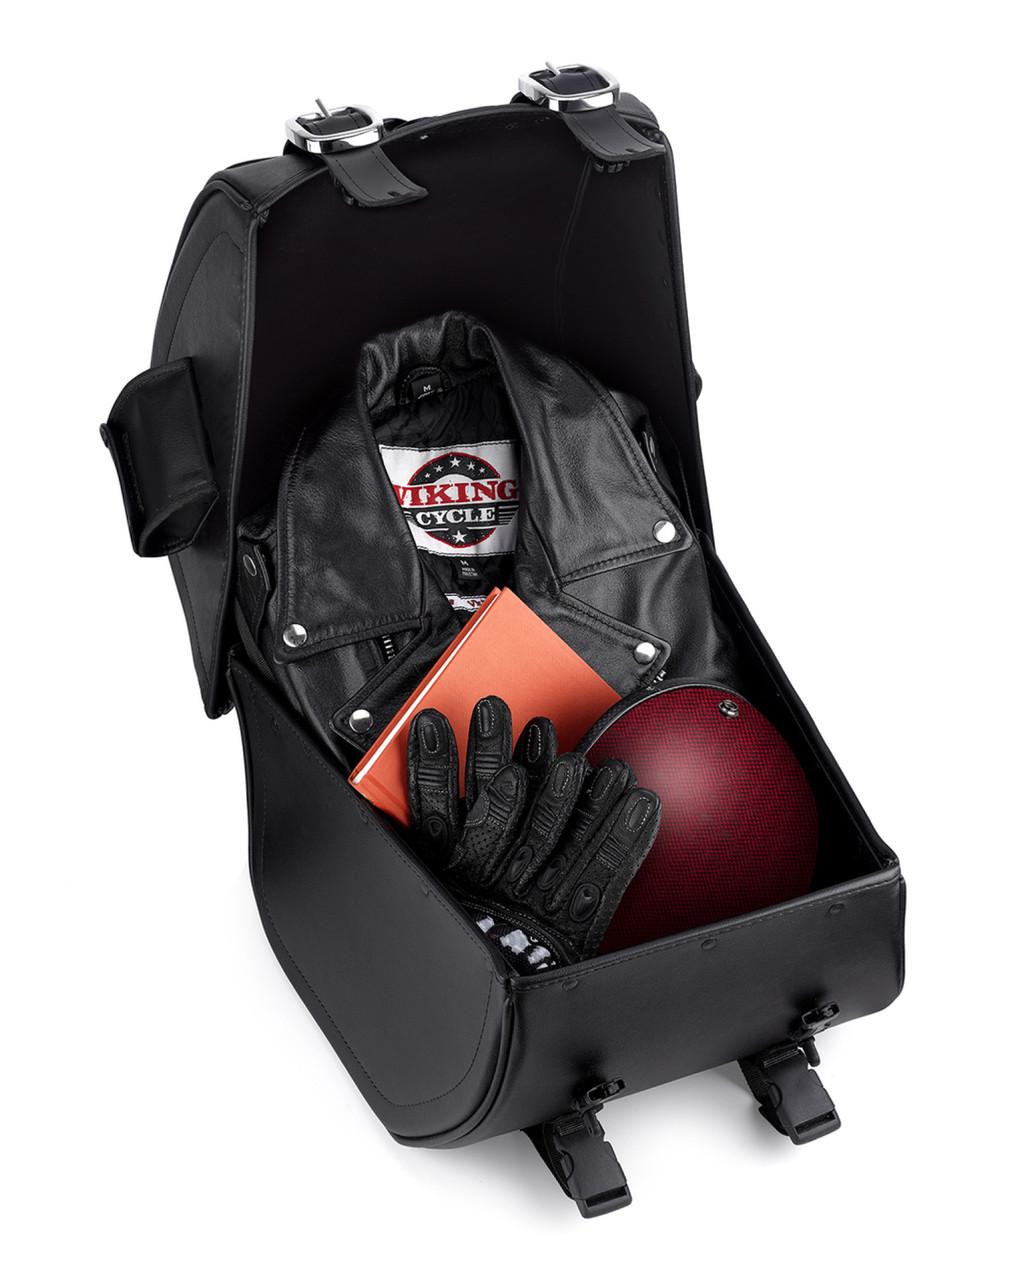 Harley Davidson Viking Classic Motorcycle Sissy Bar Bag Storage View